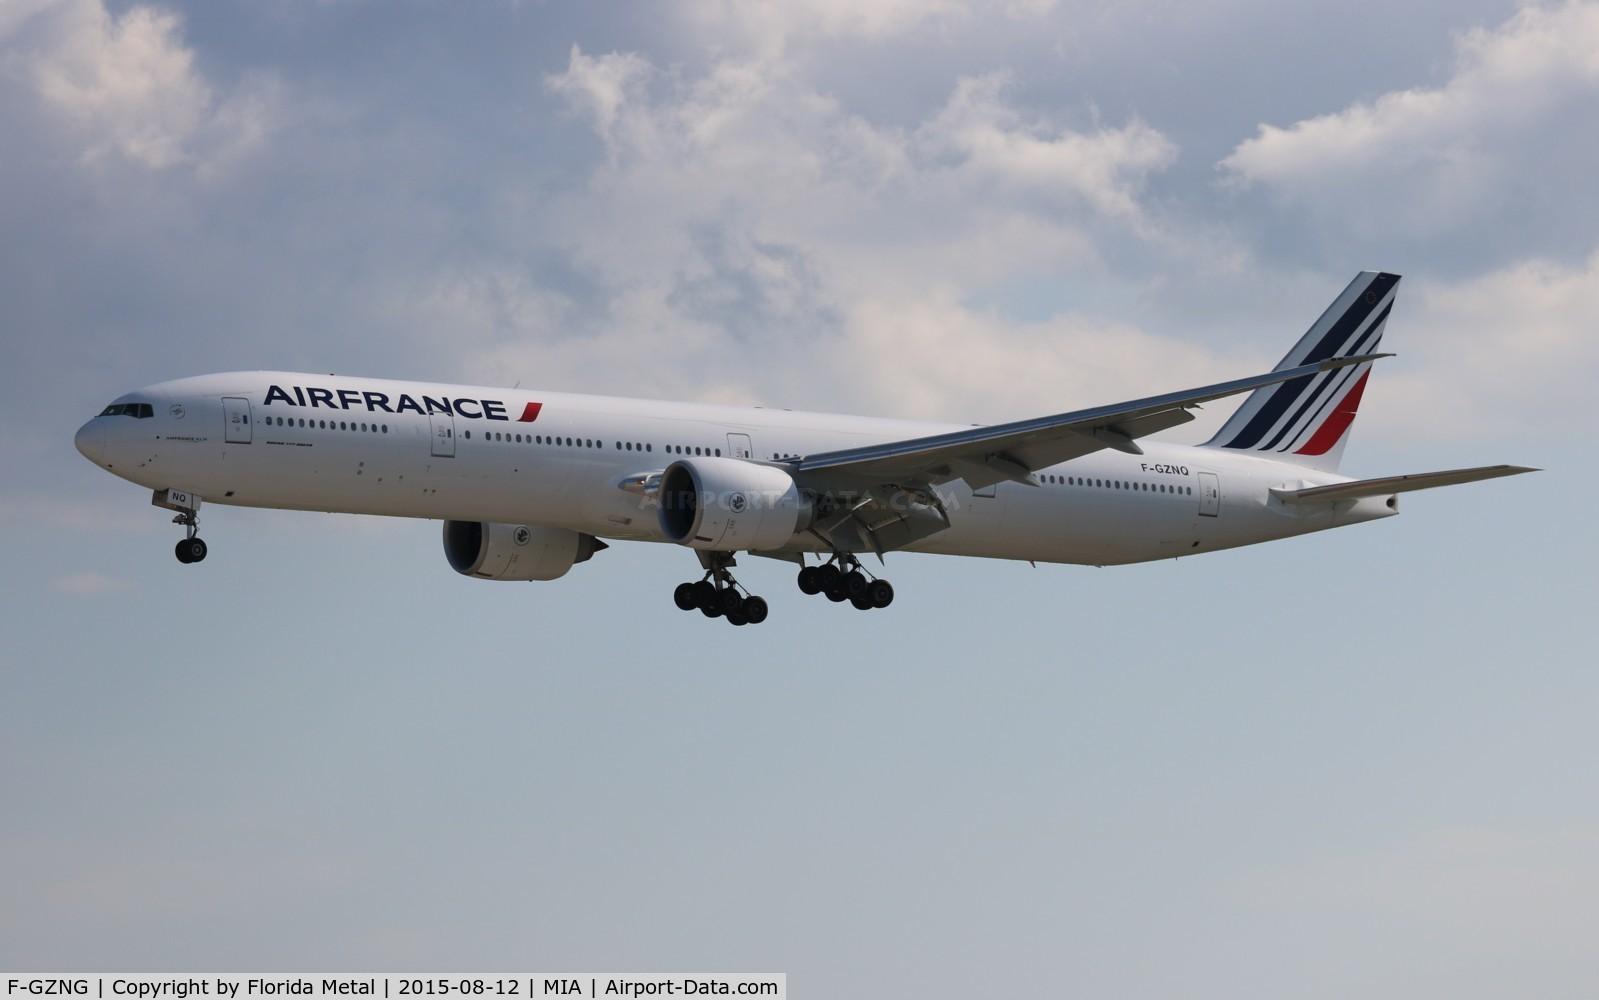 F-GZNG, 2009 Boeing 777-328/ER C/N 32968, Air France